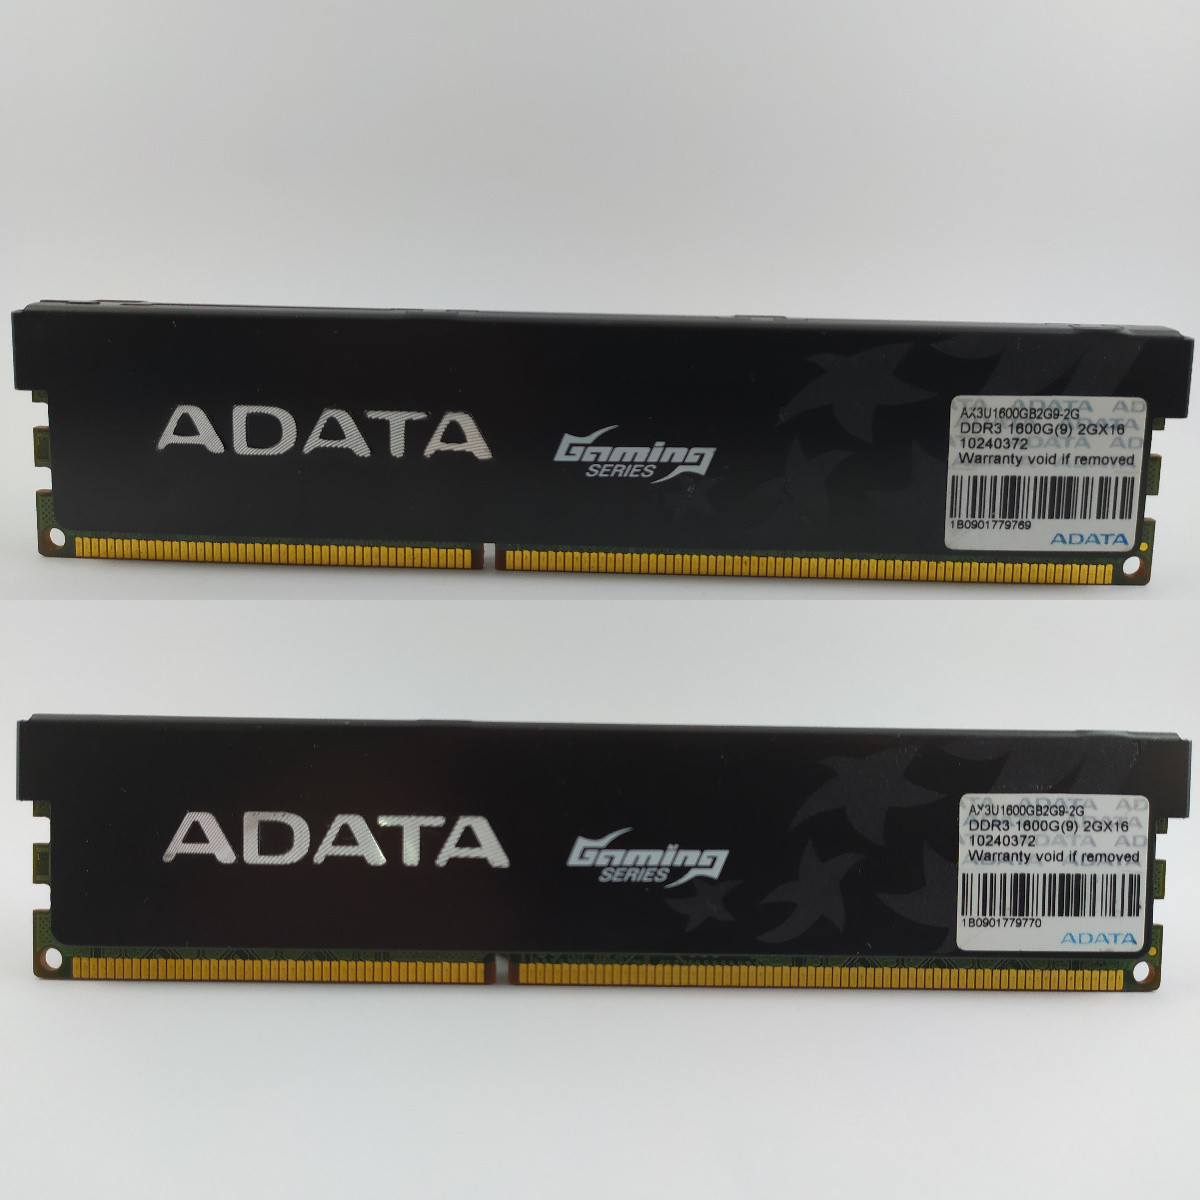 Комплект оперативной памяти ADATA XPG Gaming DDR3 4Gb (2*2Gb) 1600MHz PC3-12800 (AX3U1600GB2G9-2G) Б/У